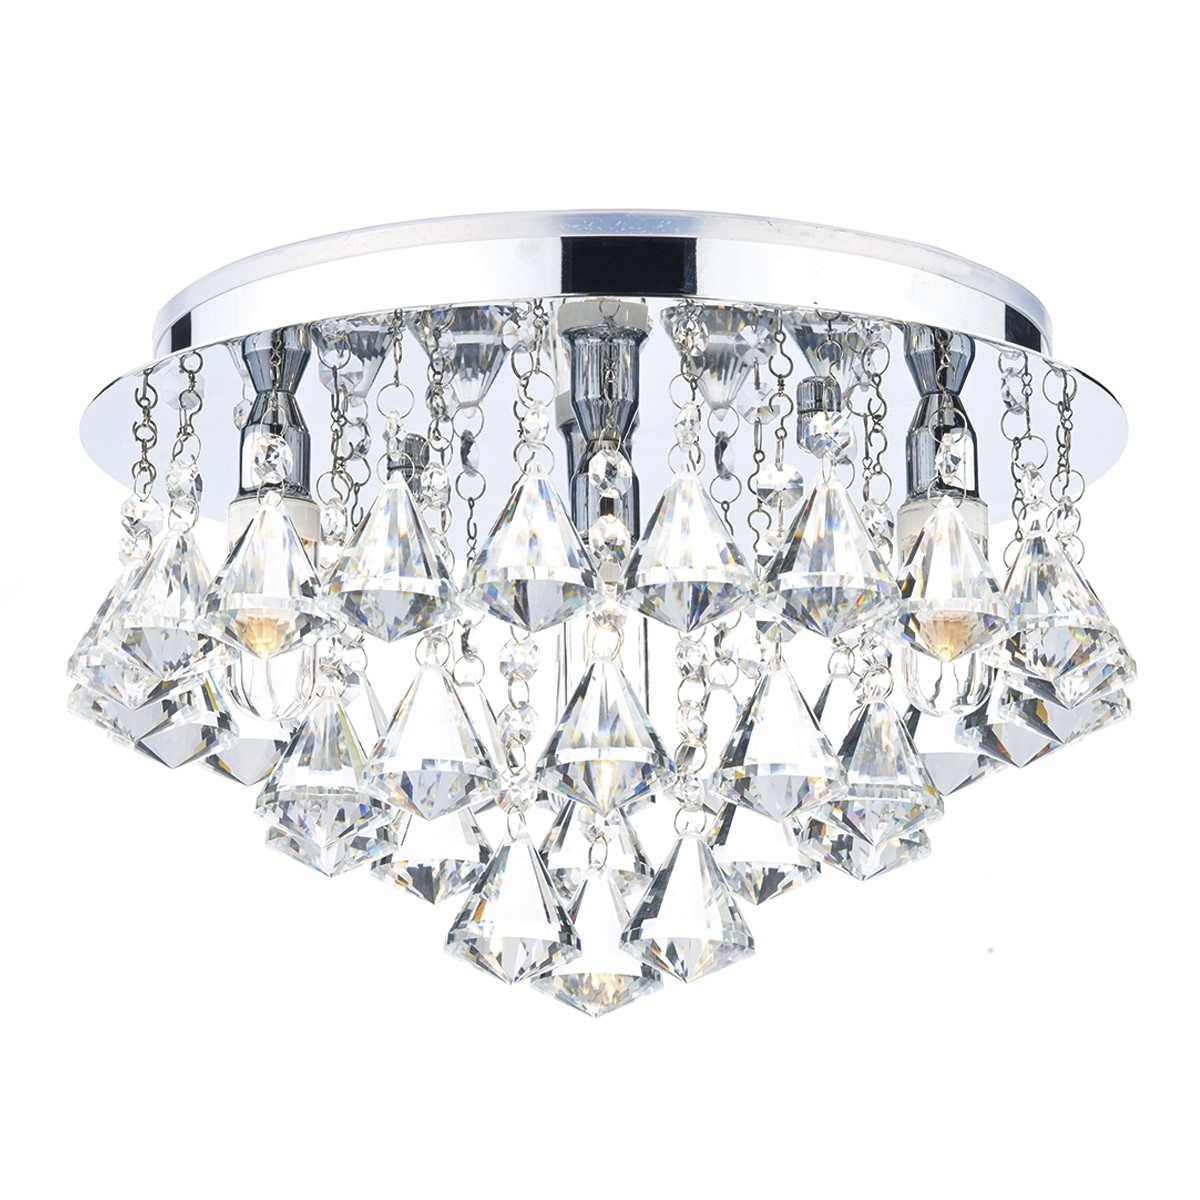 Chandelier Bathroom Ceiling Lights With Regard To Current Dar Fri0450 Fringe Flush Bathroom Ceiling Light (View 11 of 15)